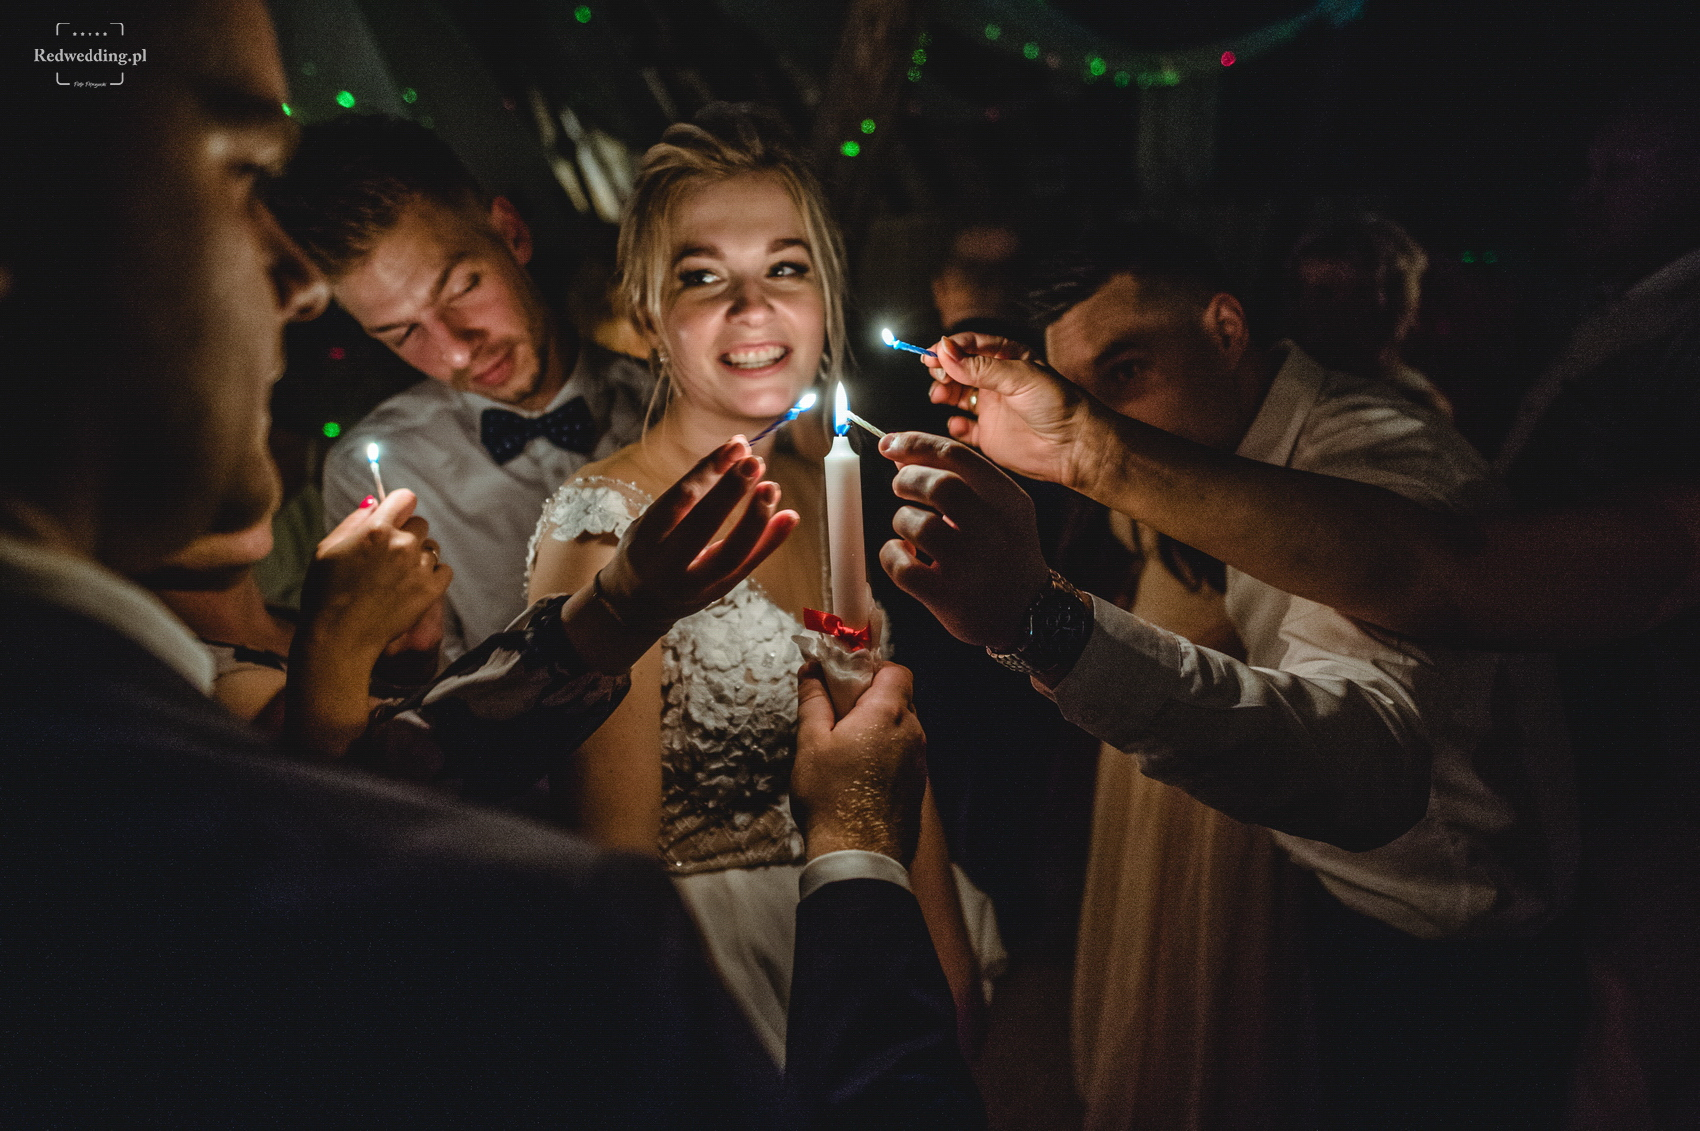 Fotograf na ślub Gdynia redwedding